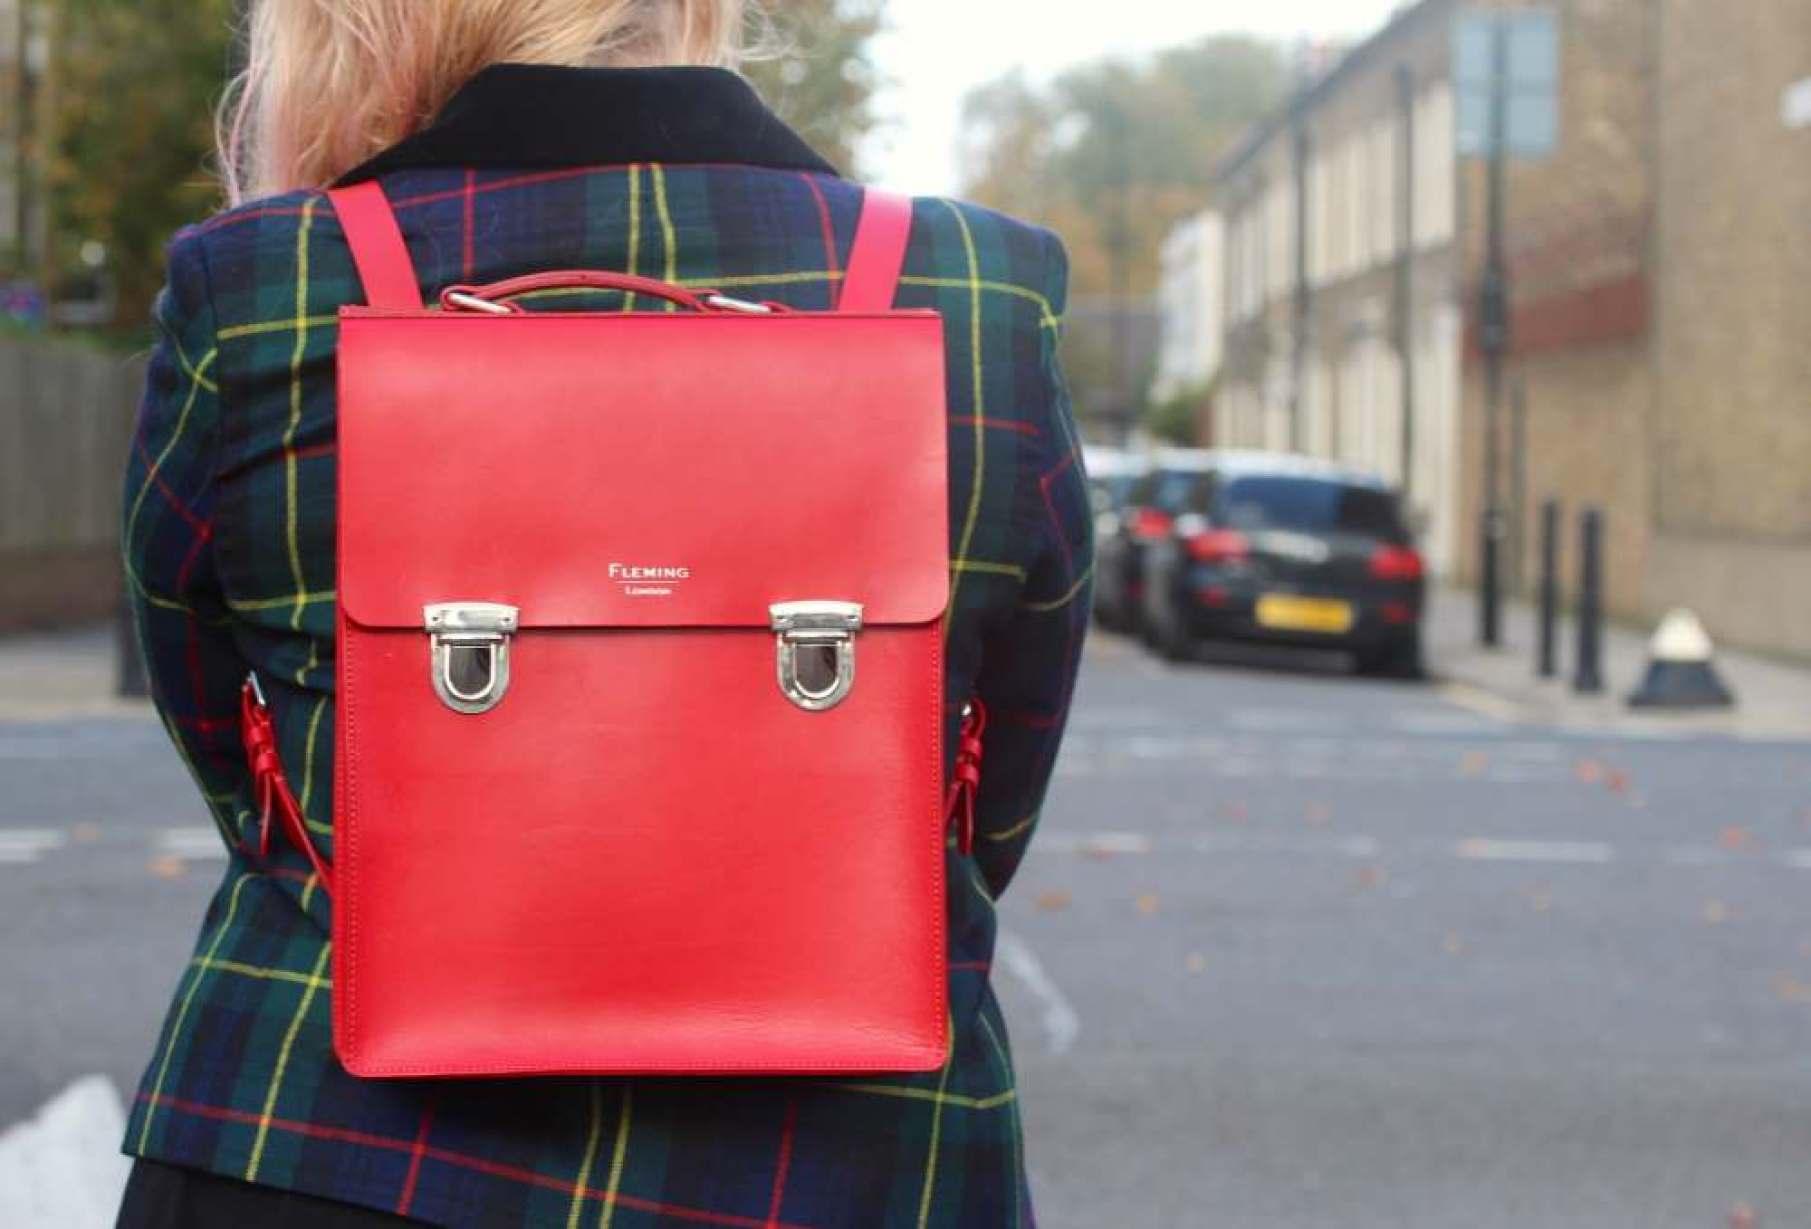 flemming london backpack